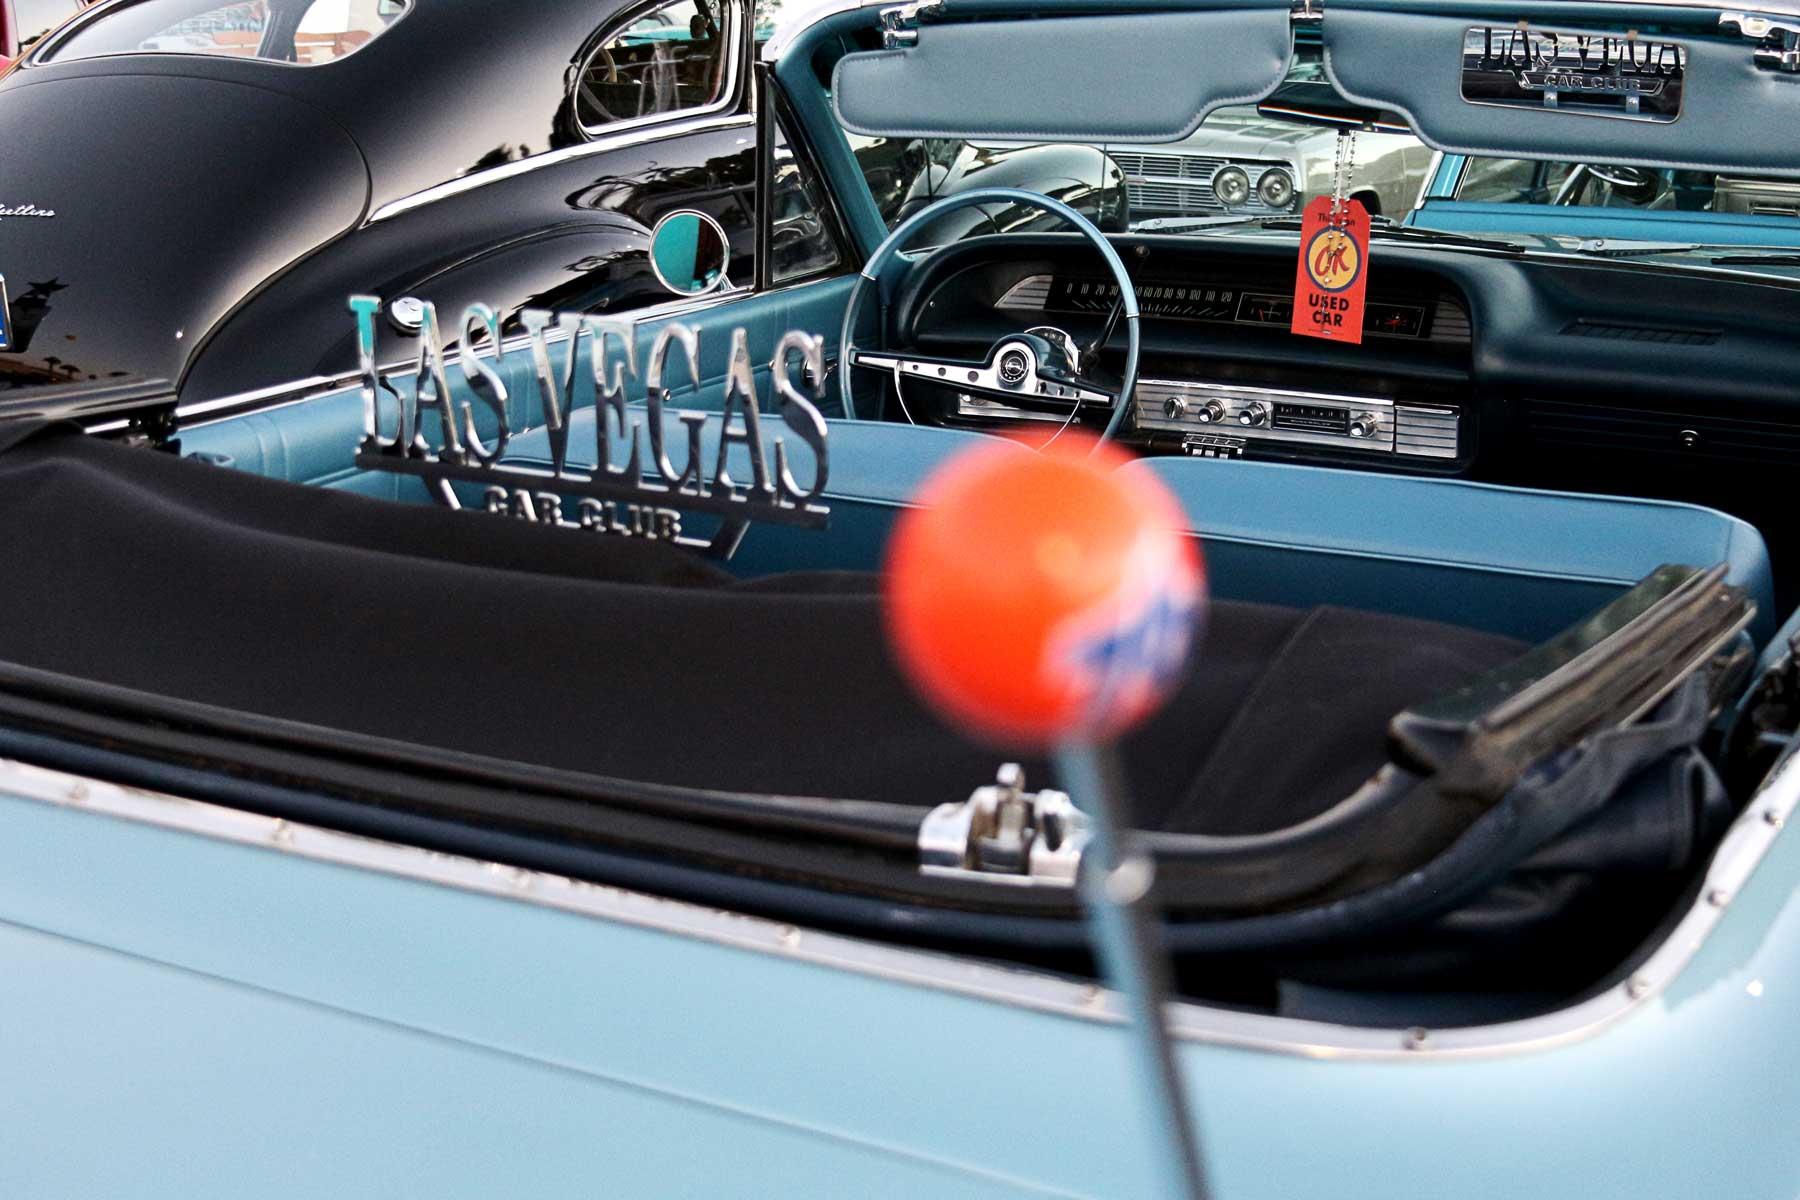 Las Vegas Car Club - 1963 Ragtop Impala